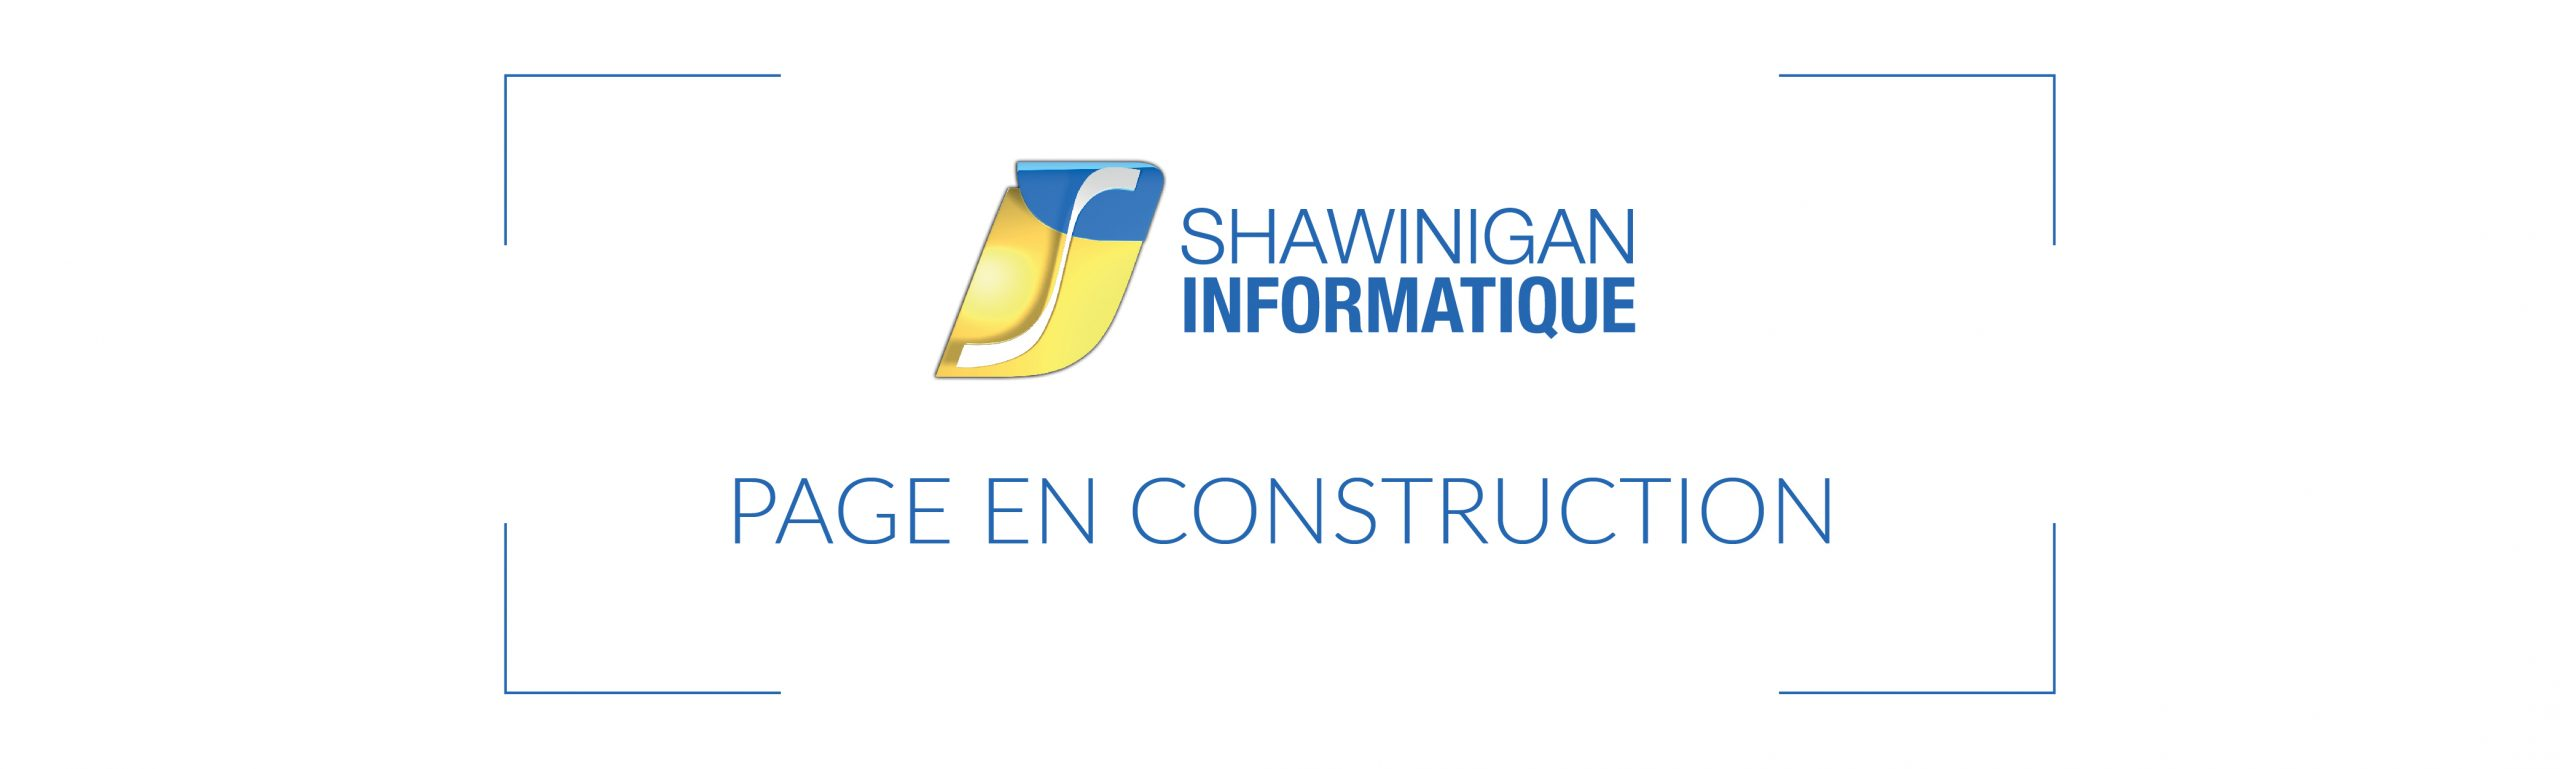 page-en-construction-01